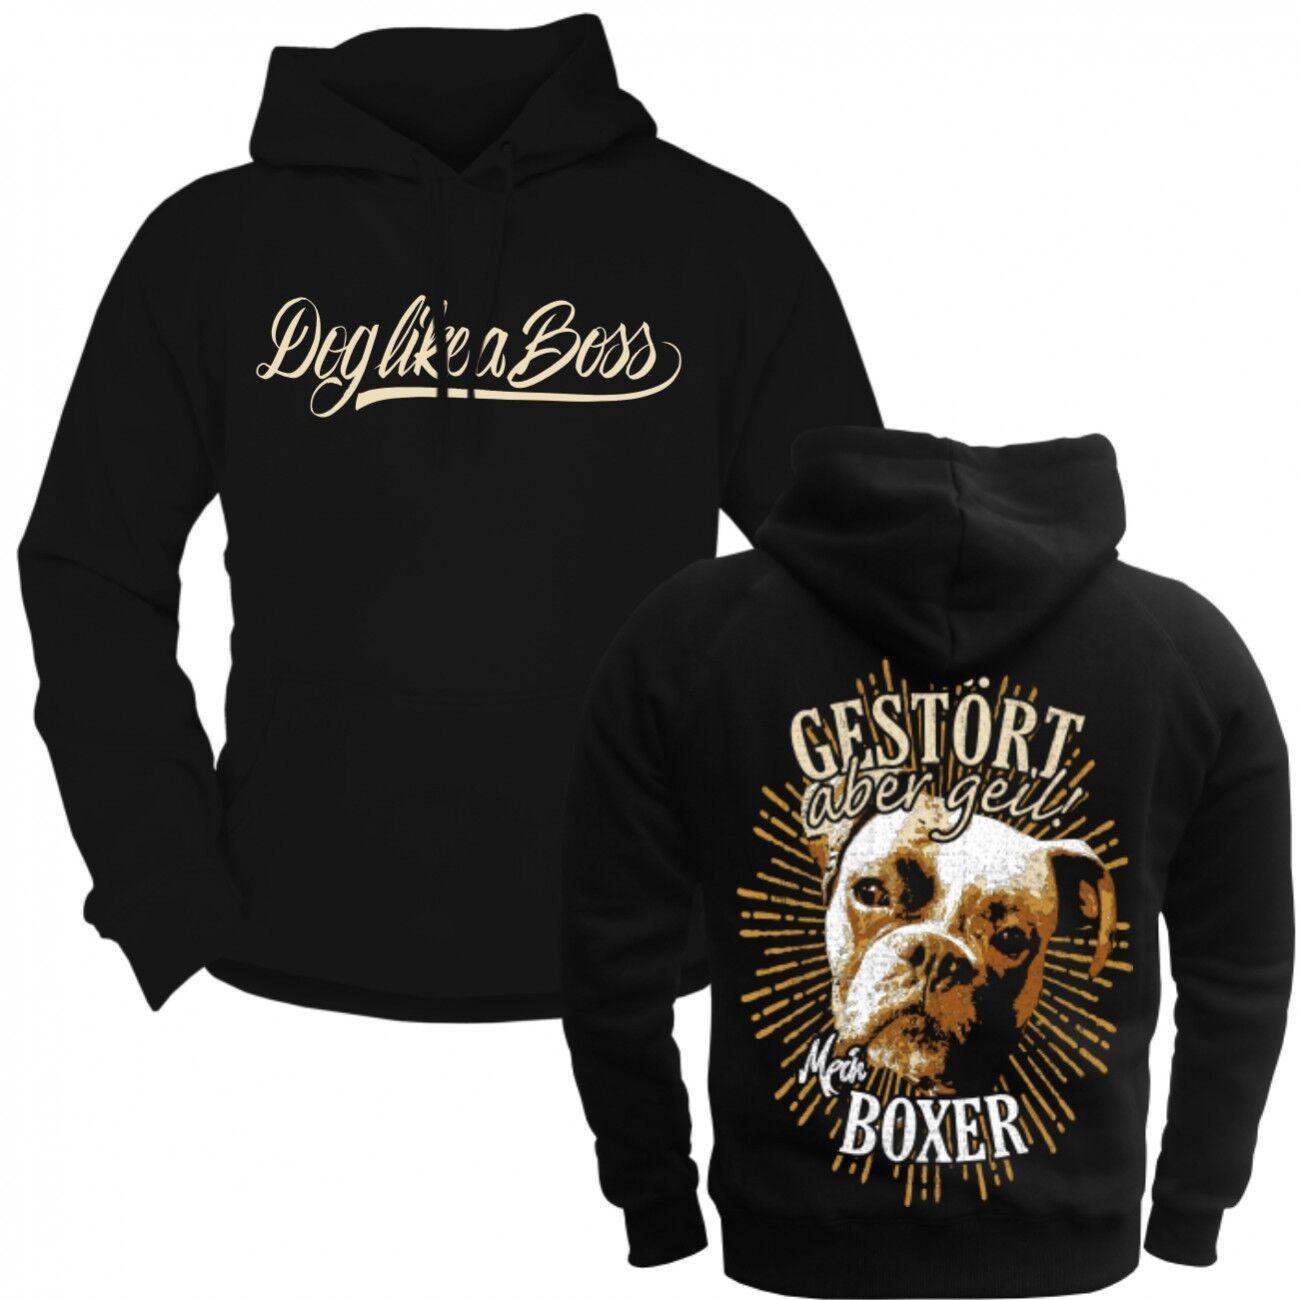 Kapuzenpul Lover hoodie Deutscher Boxer razza Molosser begleithunde PROTEZIONE CANI